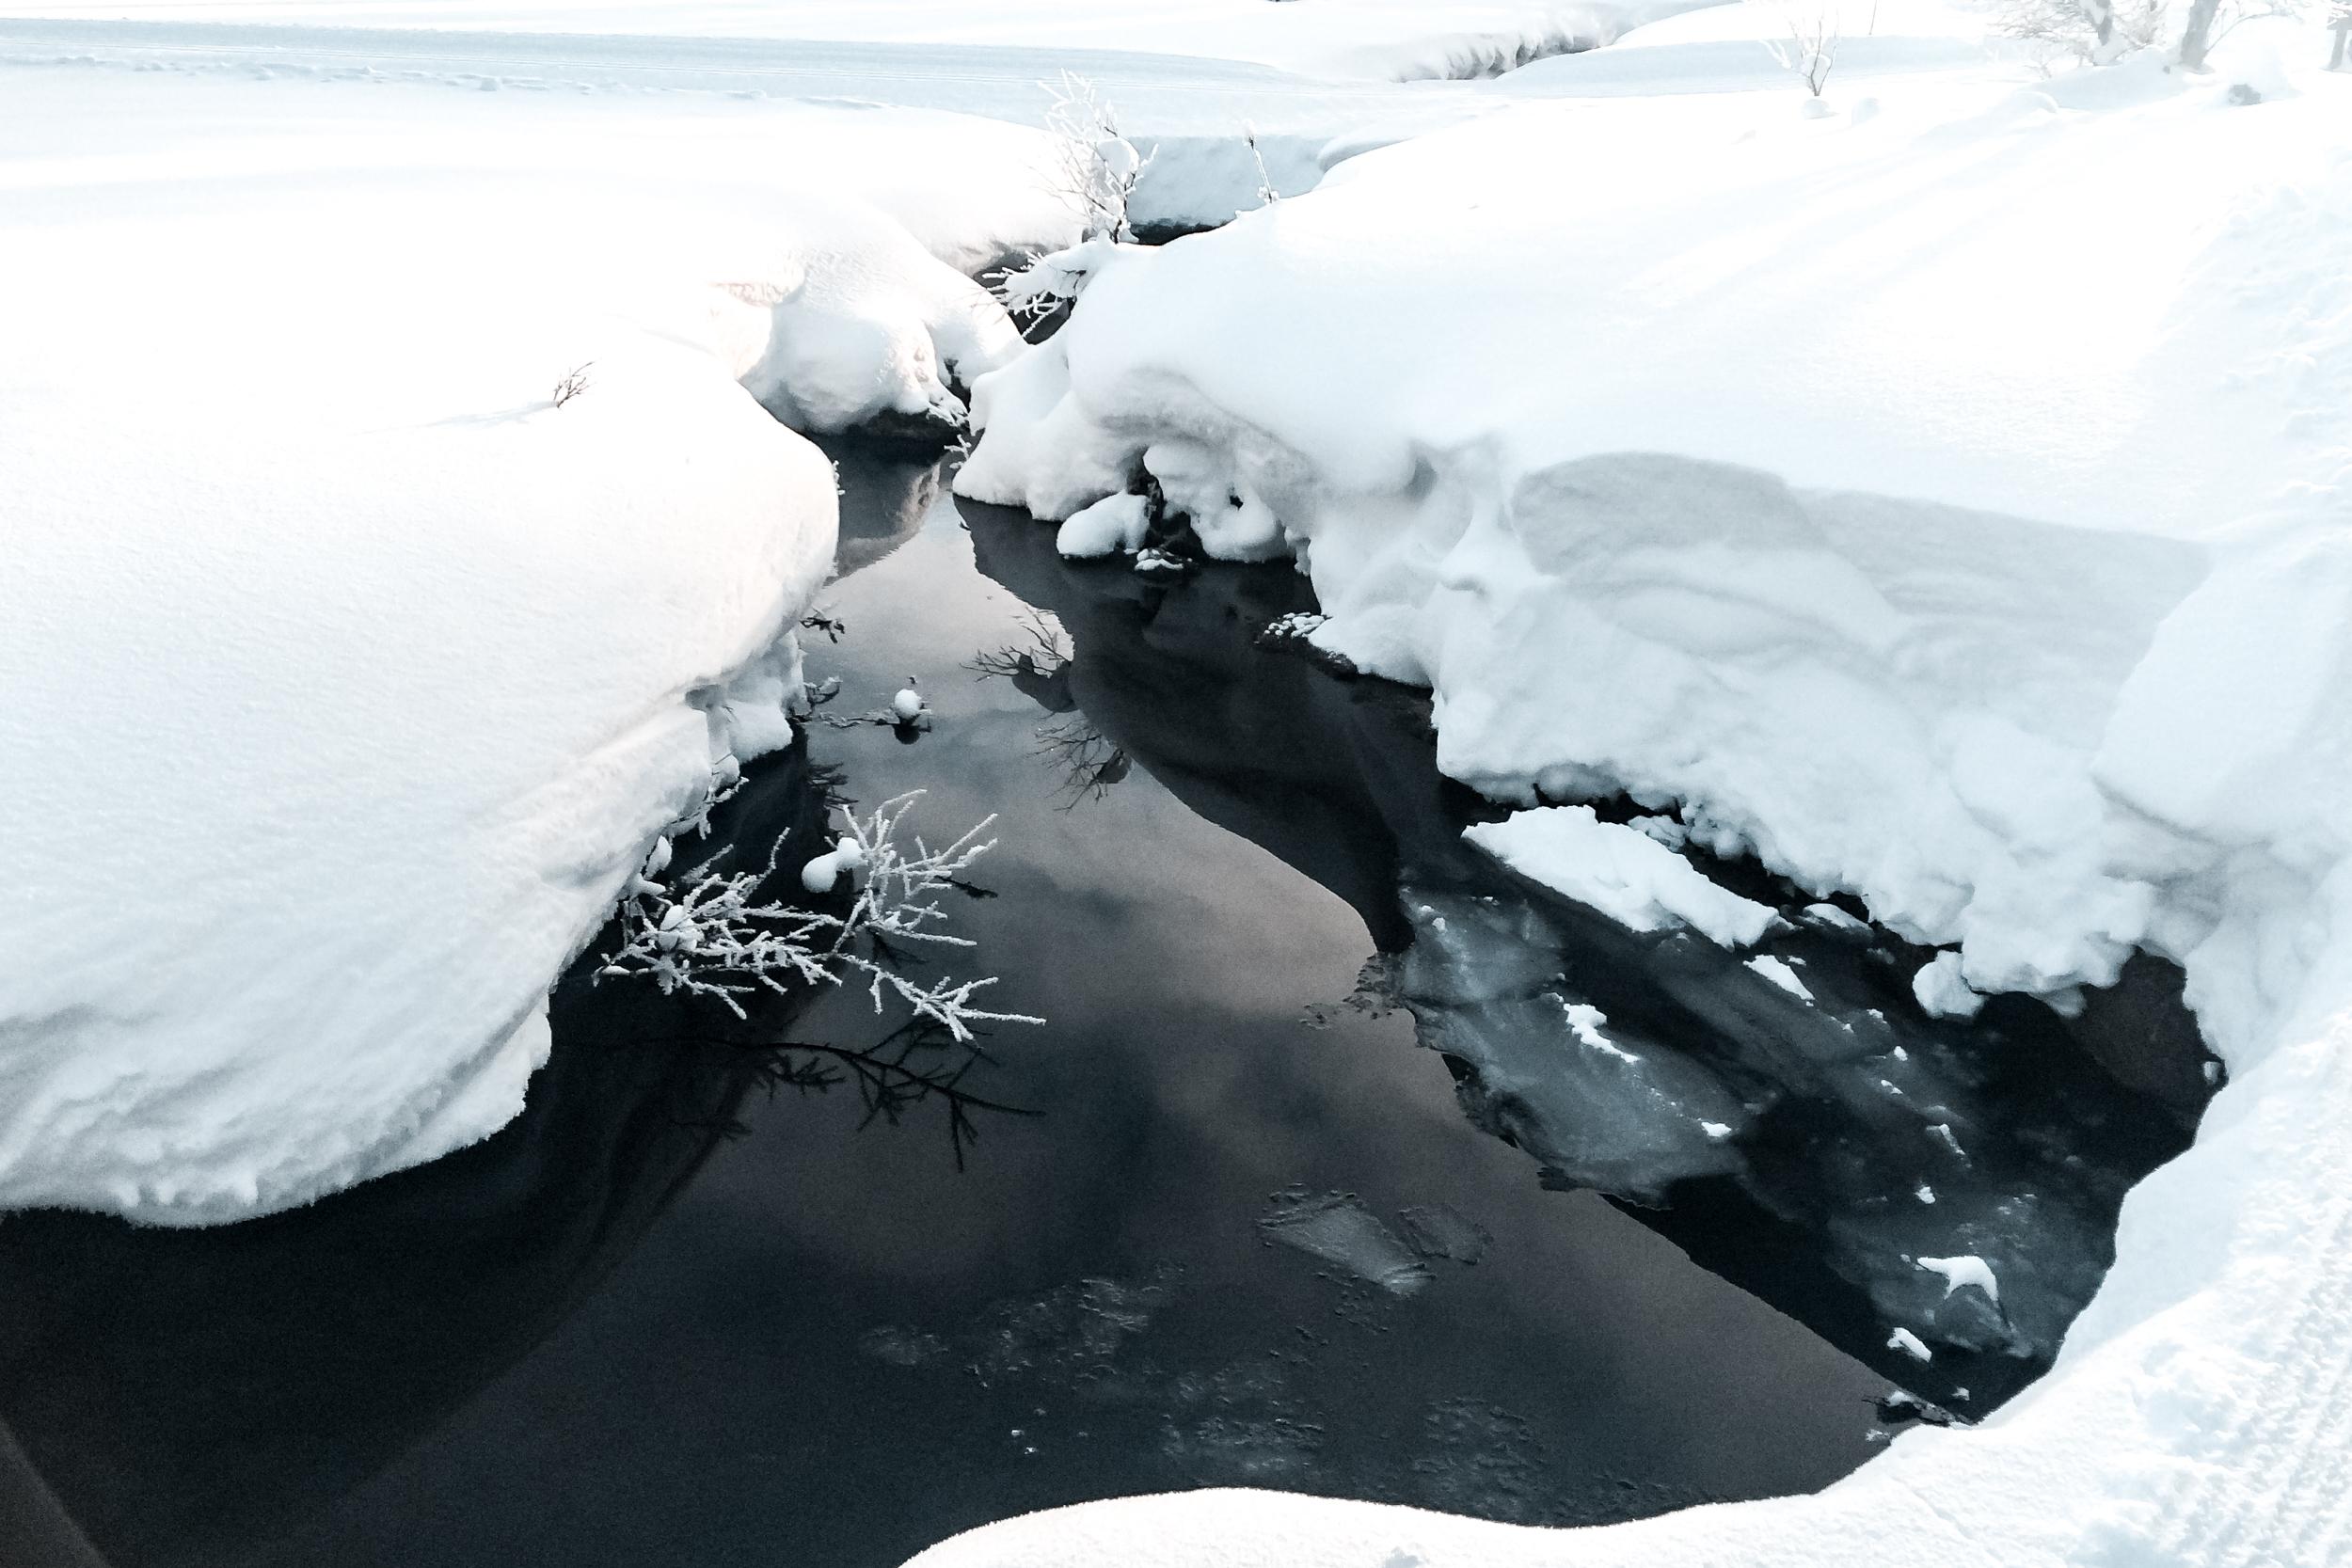 Nina Marquardsen Fotografi fra vinterferie 2018